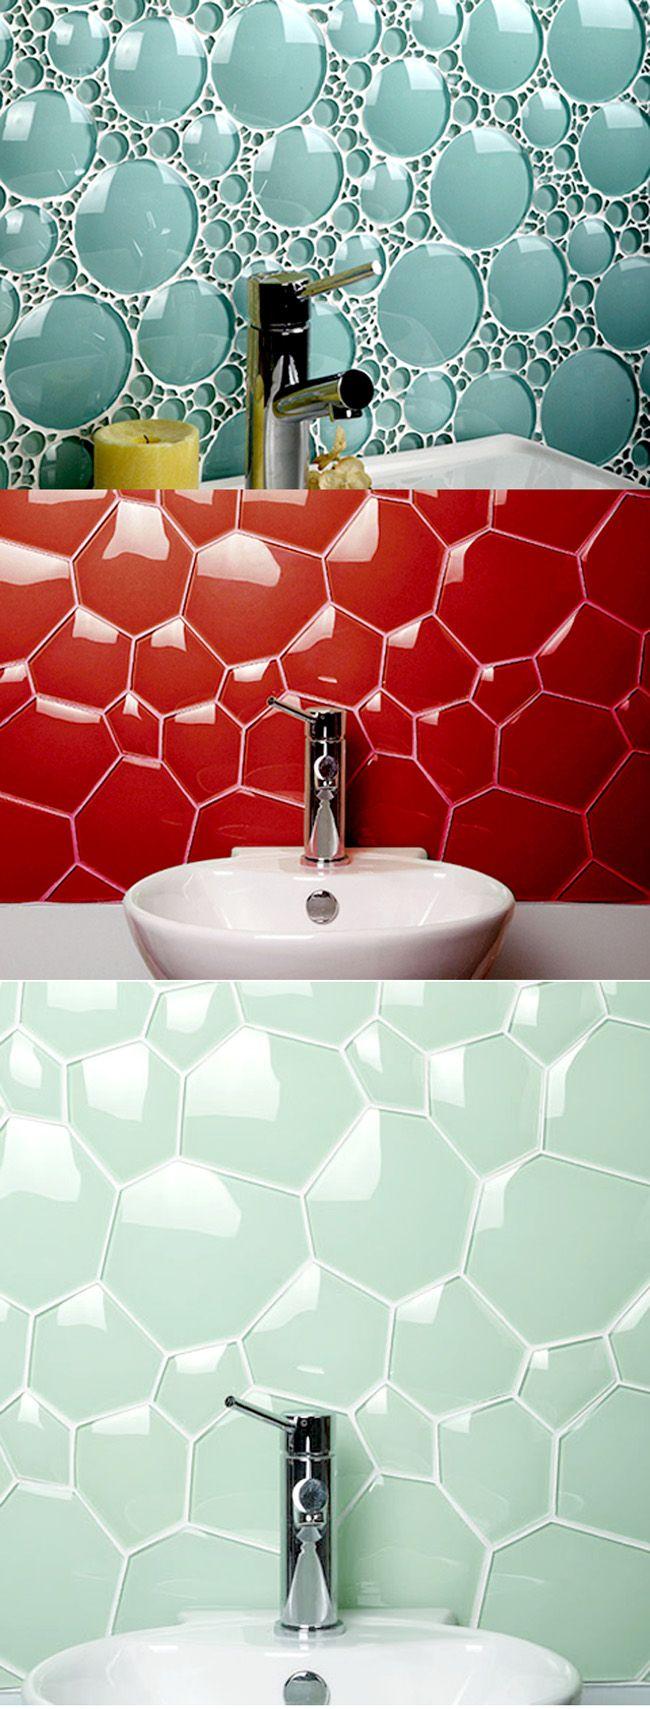 Espuma Really cool Glass tiles